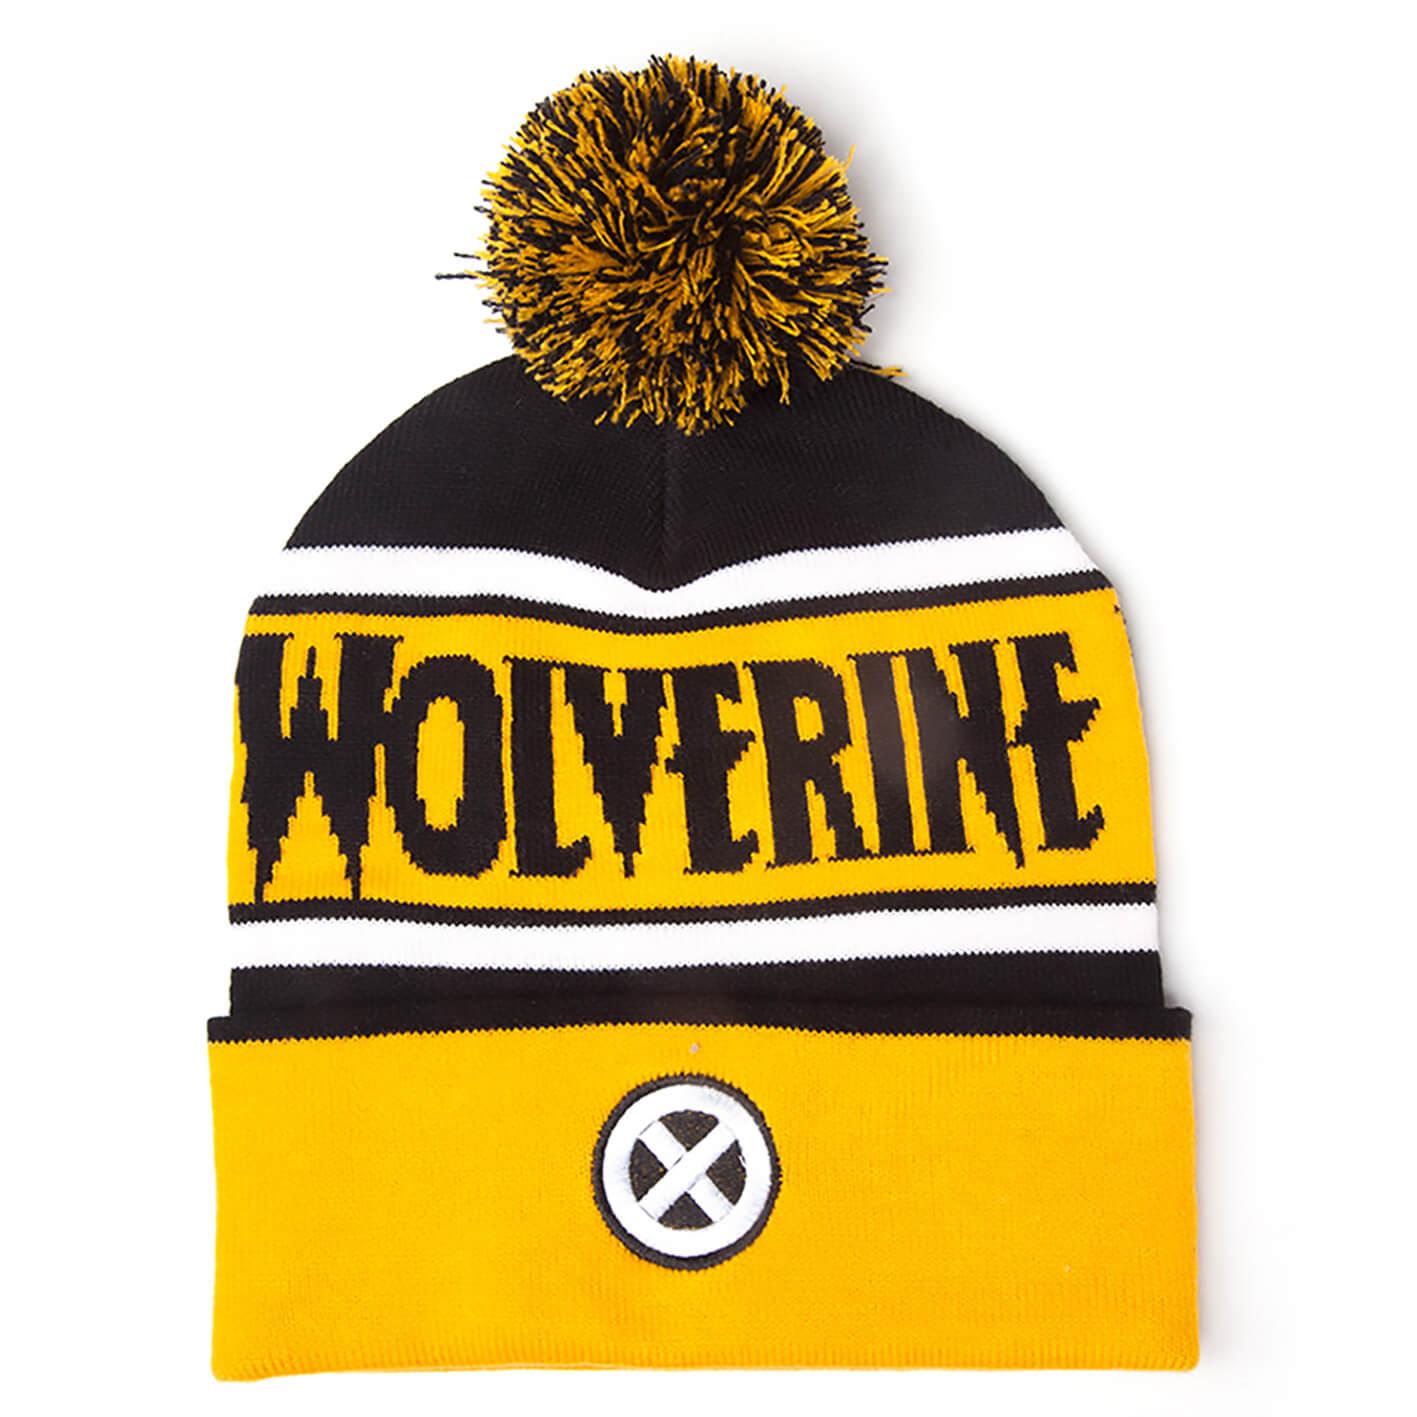 Marvel X-Men Men s Wolverine Beanie Hat with Pompom - Yellow Merchandise  59d1662dacb